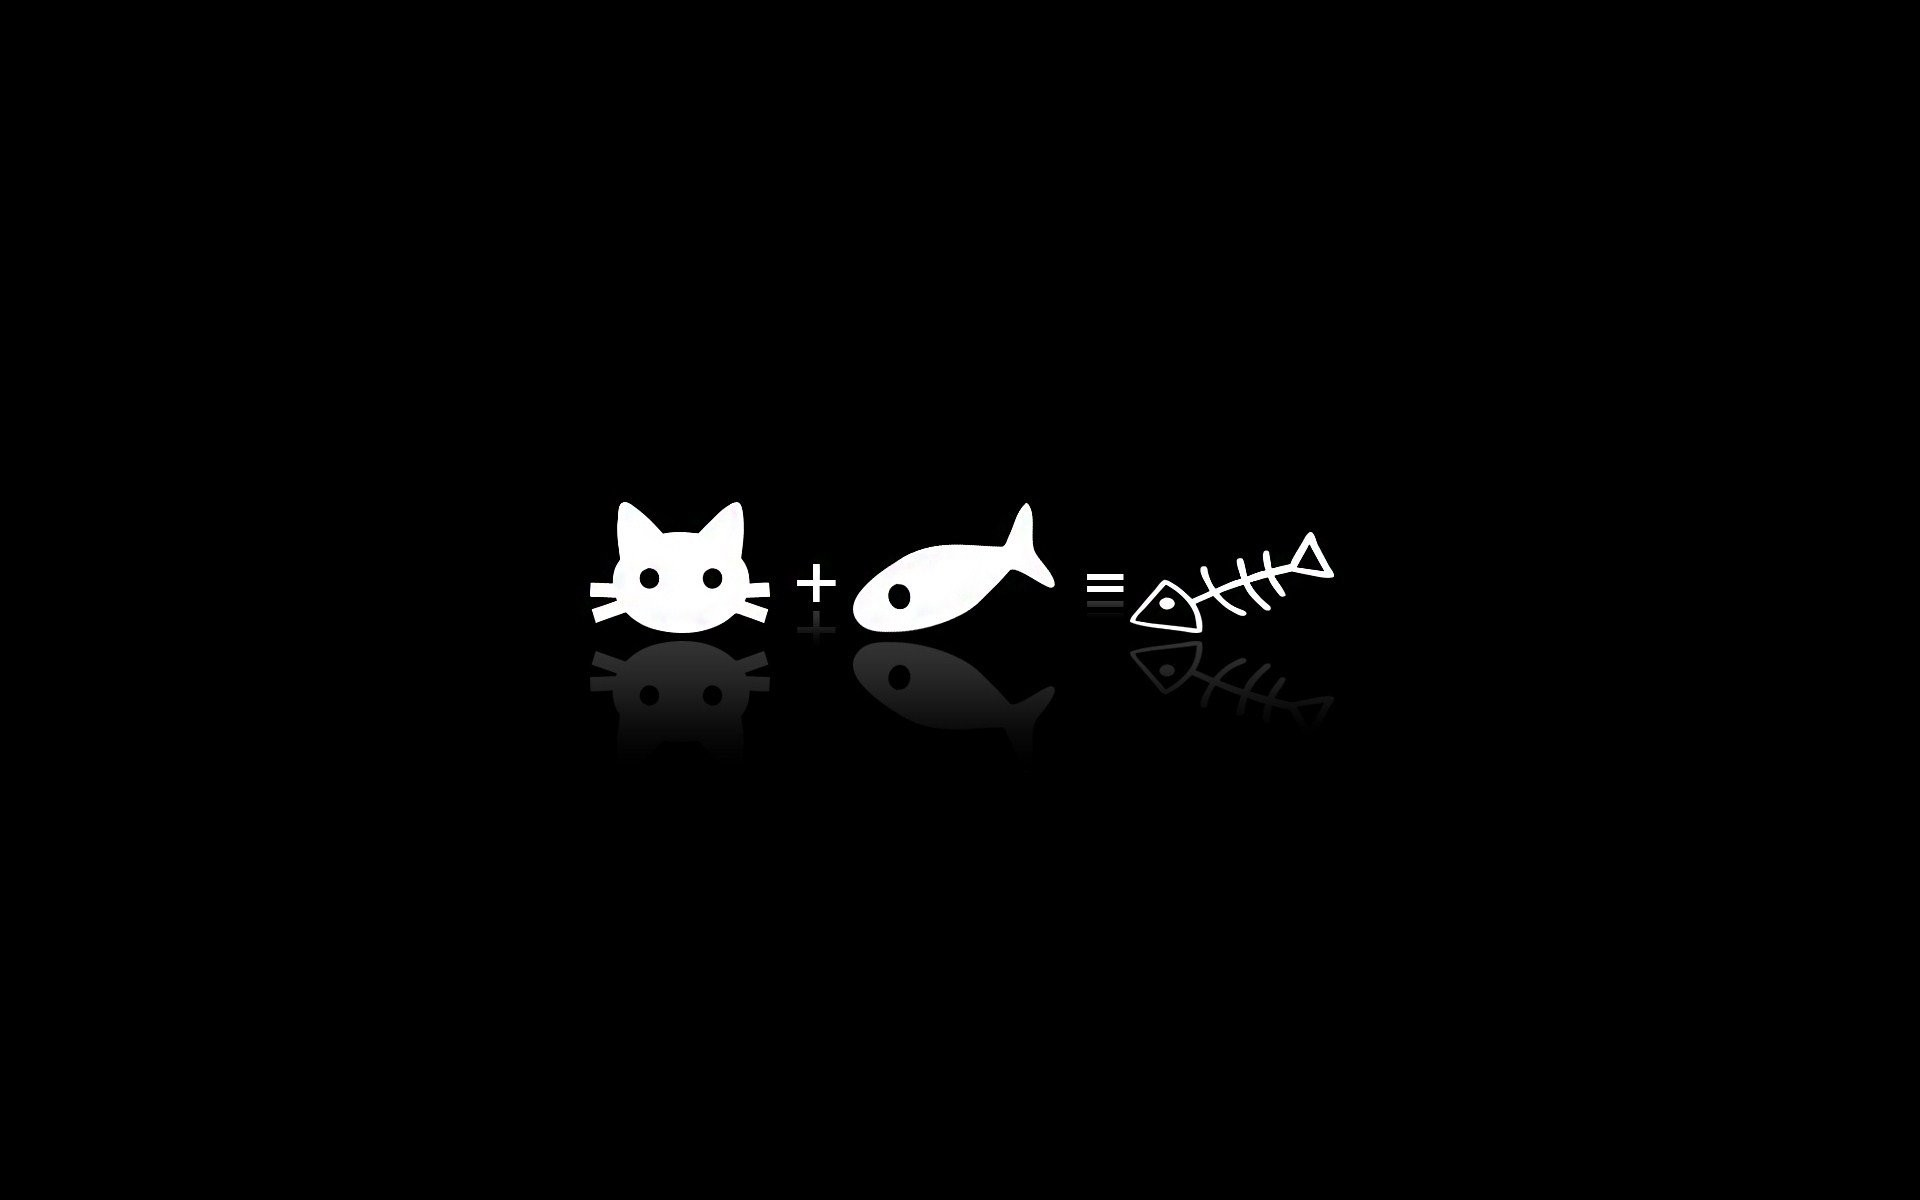 Wallpaper Cartoon Cat